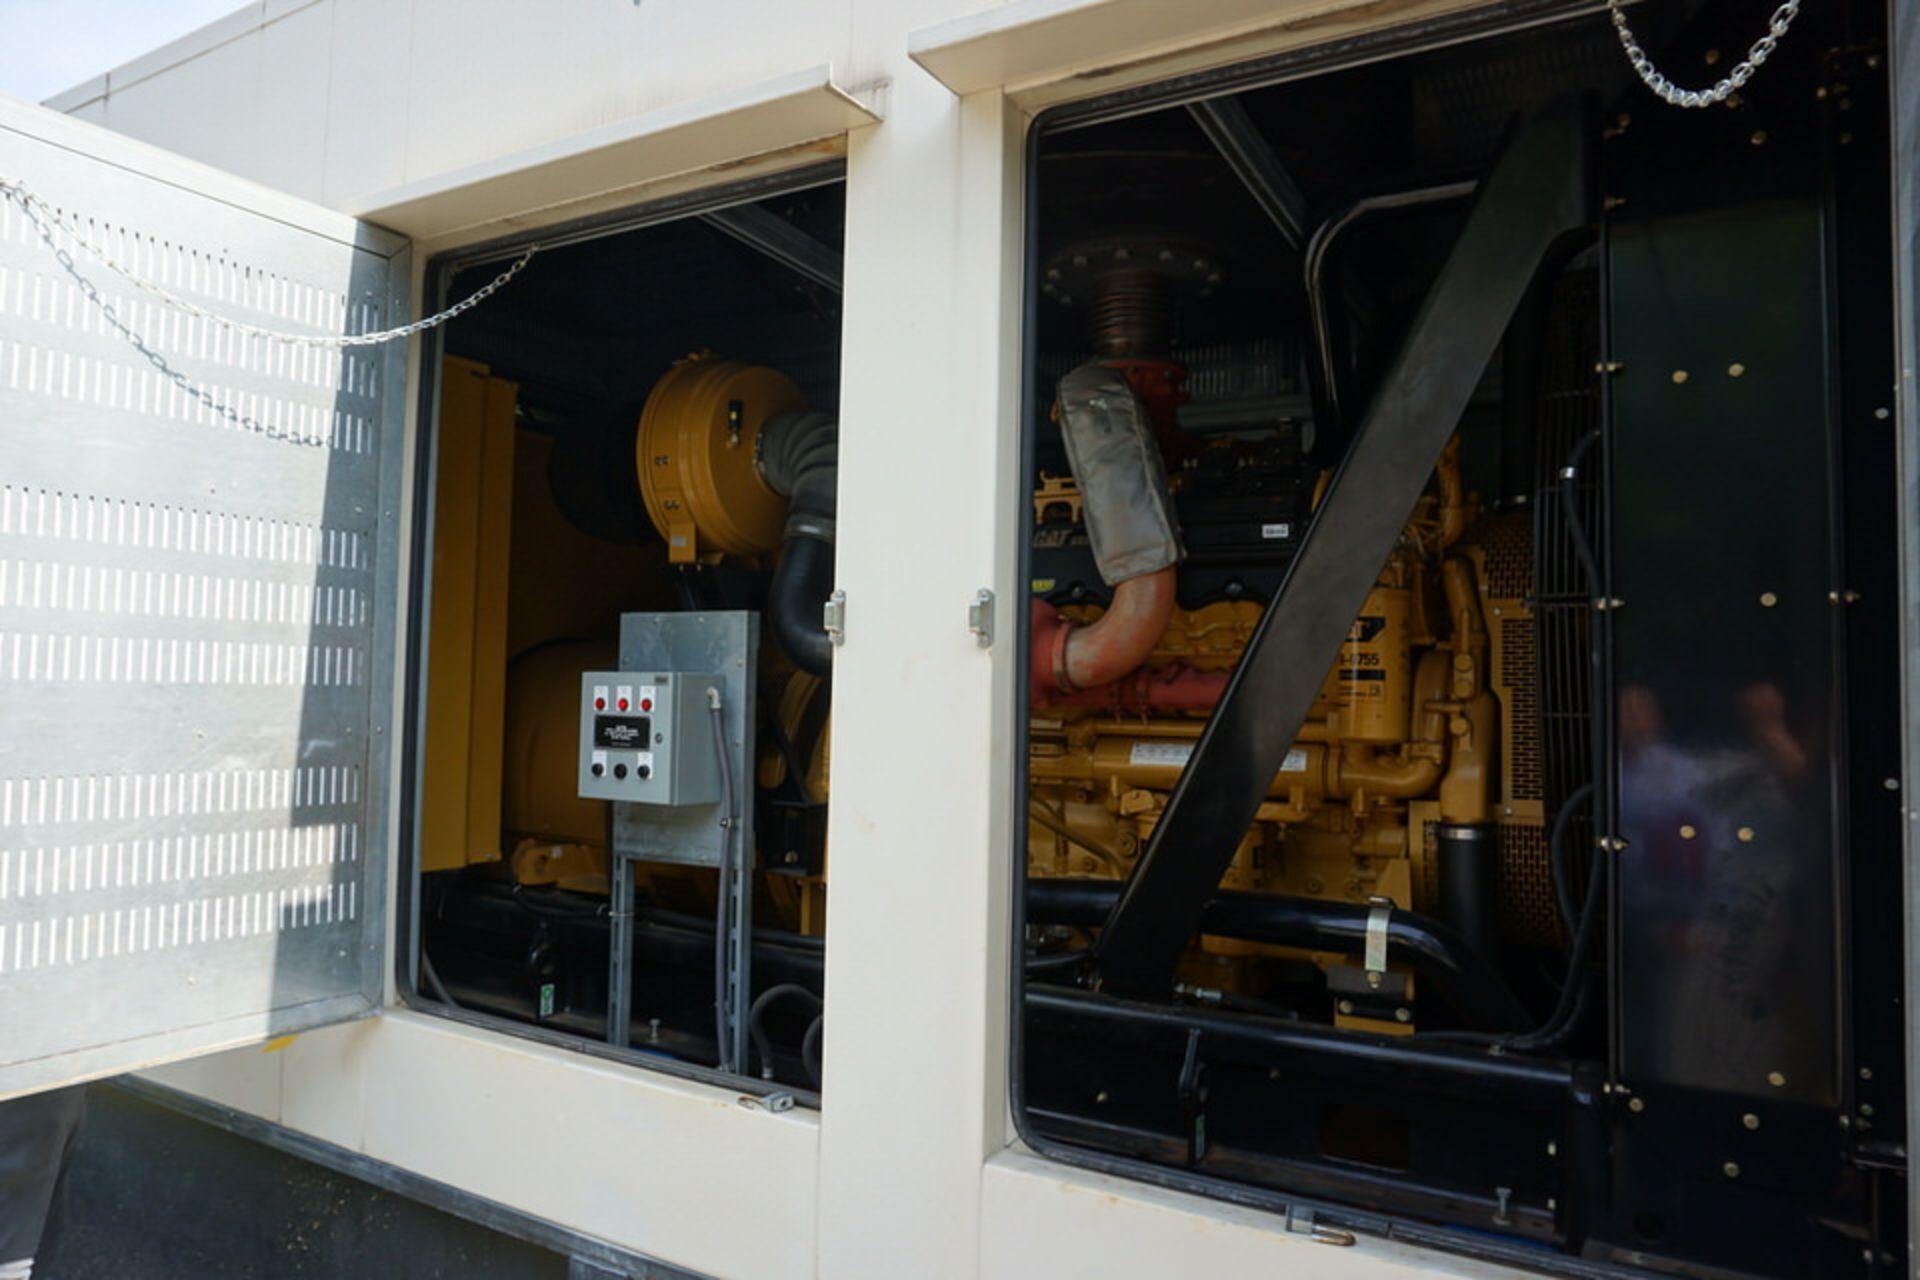 2007 CATERPILLAR BACK UP GENERATOR, ENGINE MODEL: C32 W/ EMCP3.3 CONTROL, 173.9 HOURS, 1250 KVA - Image 22 of 25